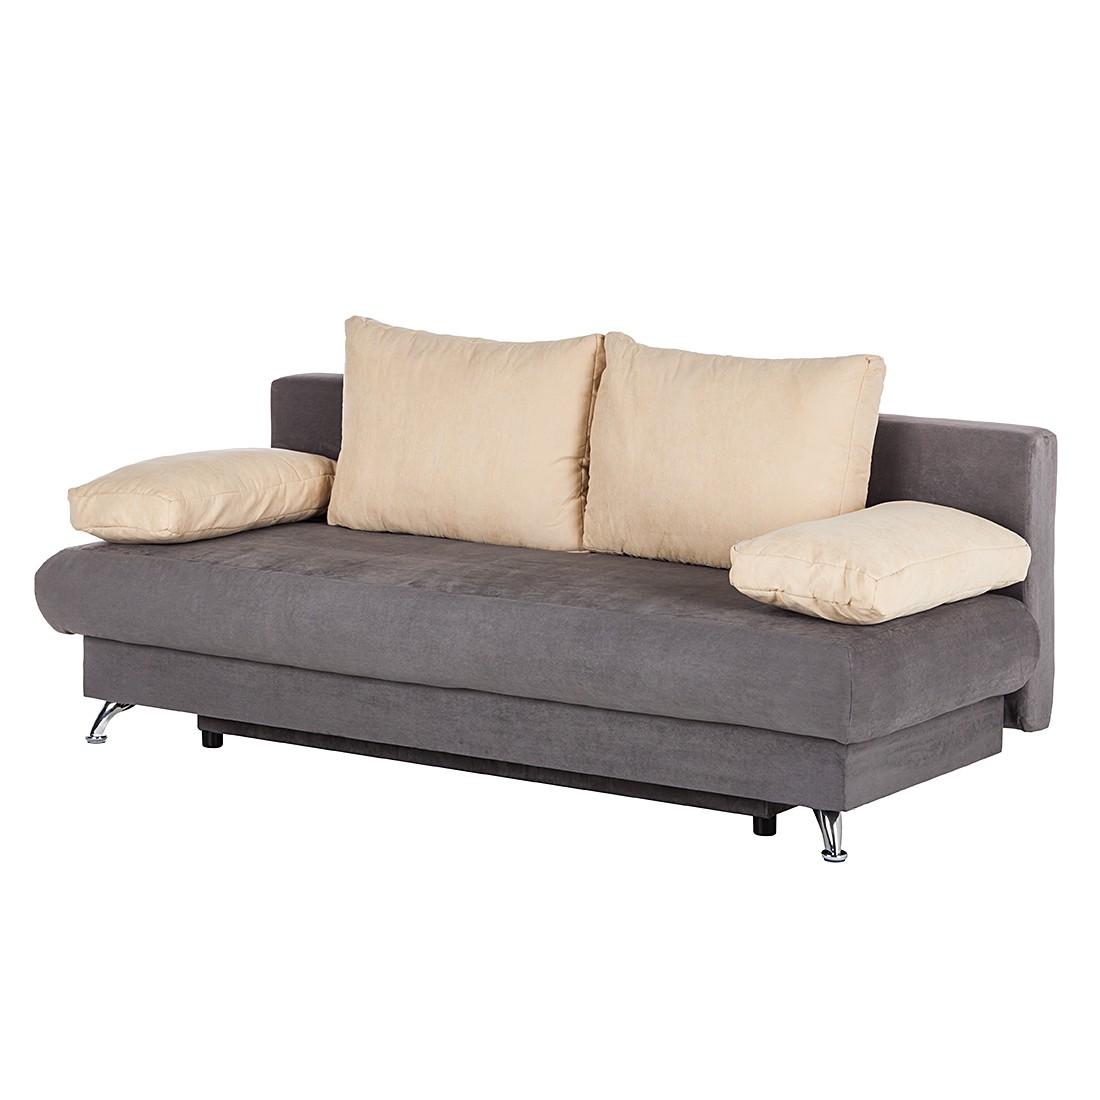 boxspringbett falun microfaser braun mooved g nstig. Black Bedroom Furniture Sets. Home Design Ideas